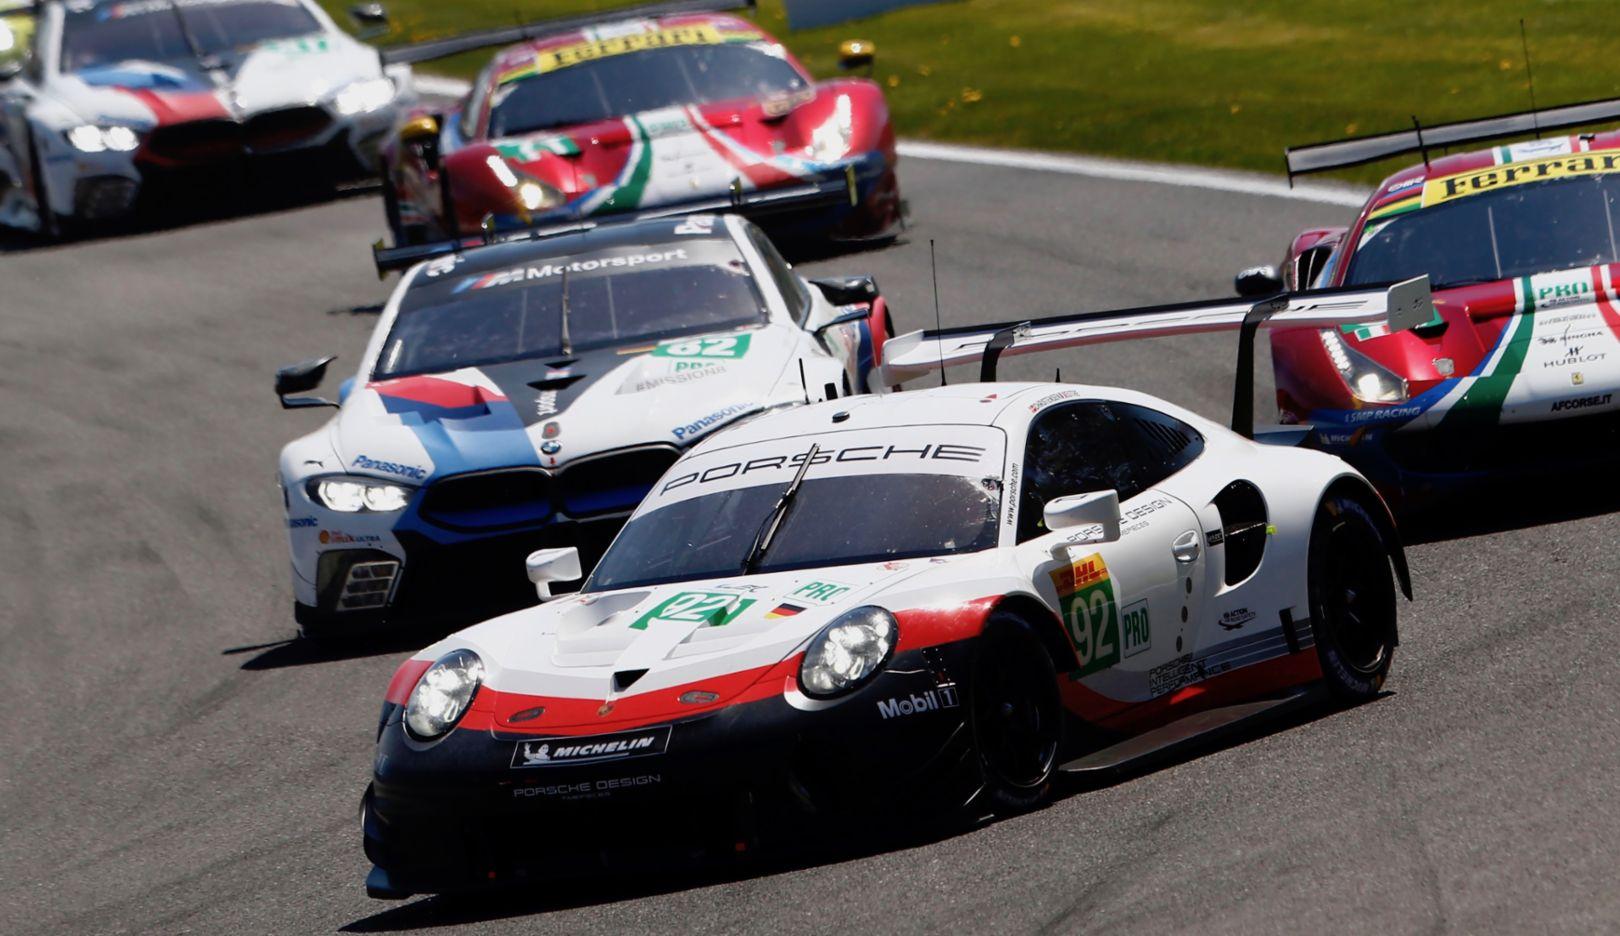 911 RSR, Rennen, Spa-Francorchamps, FIA WEC, 2018, Porsche AG